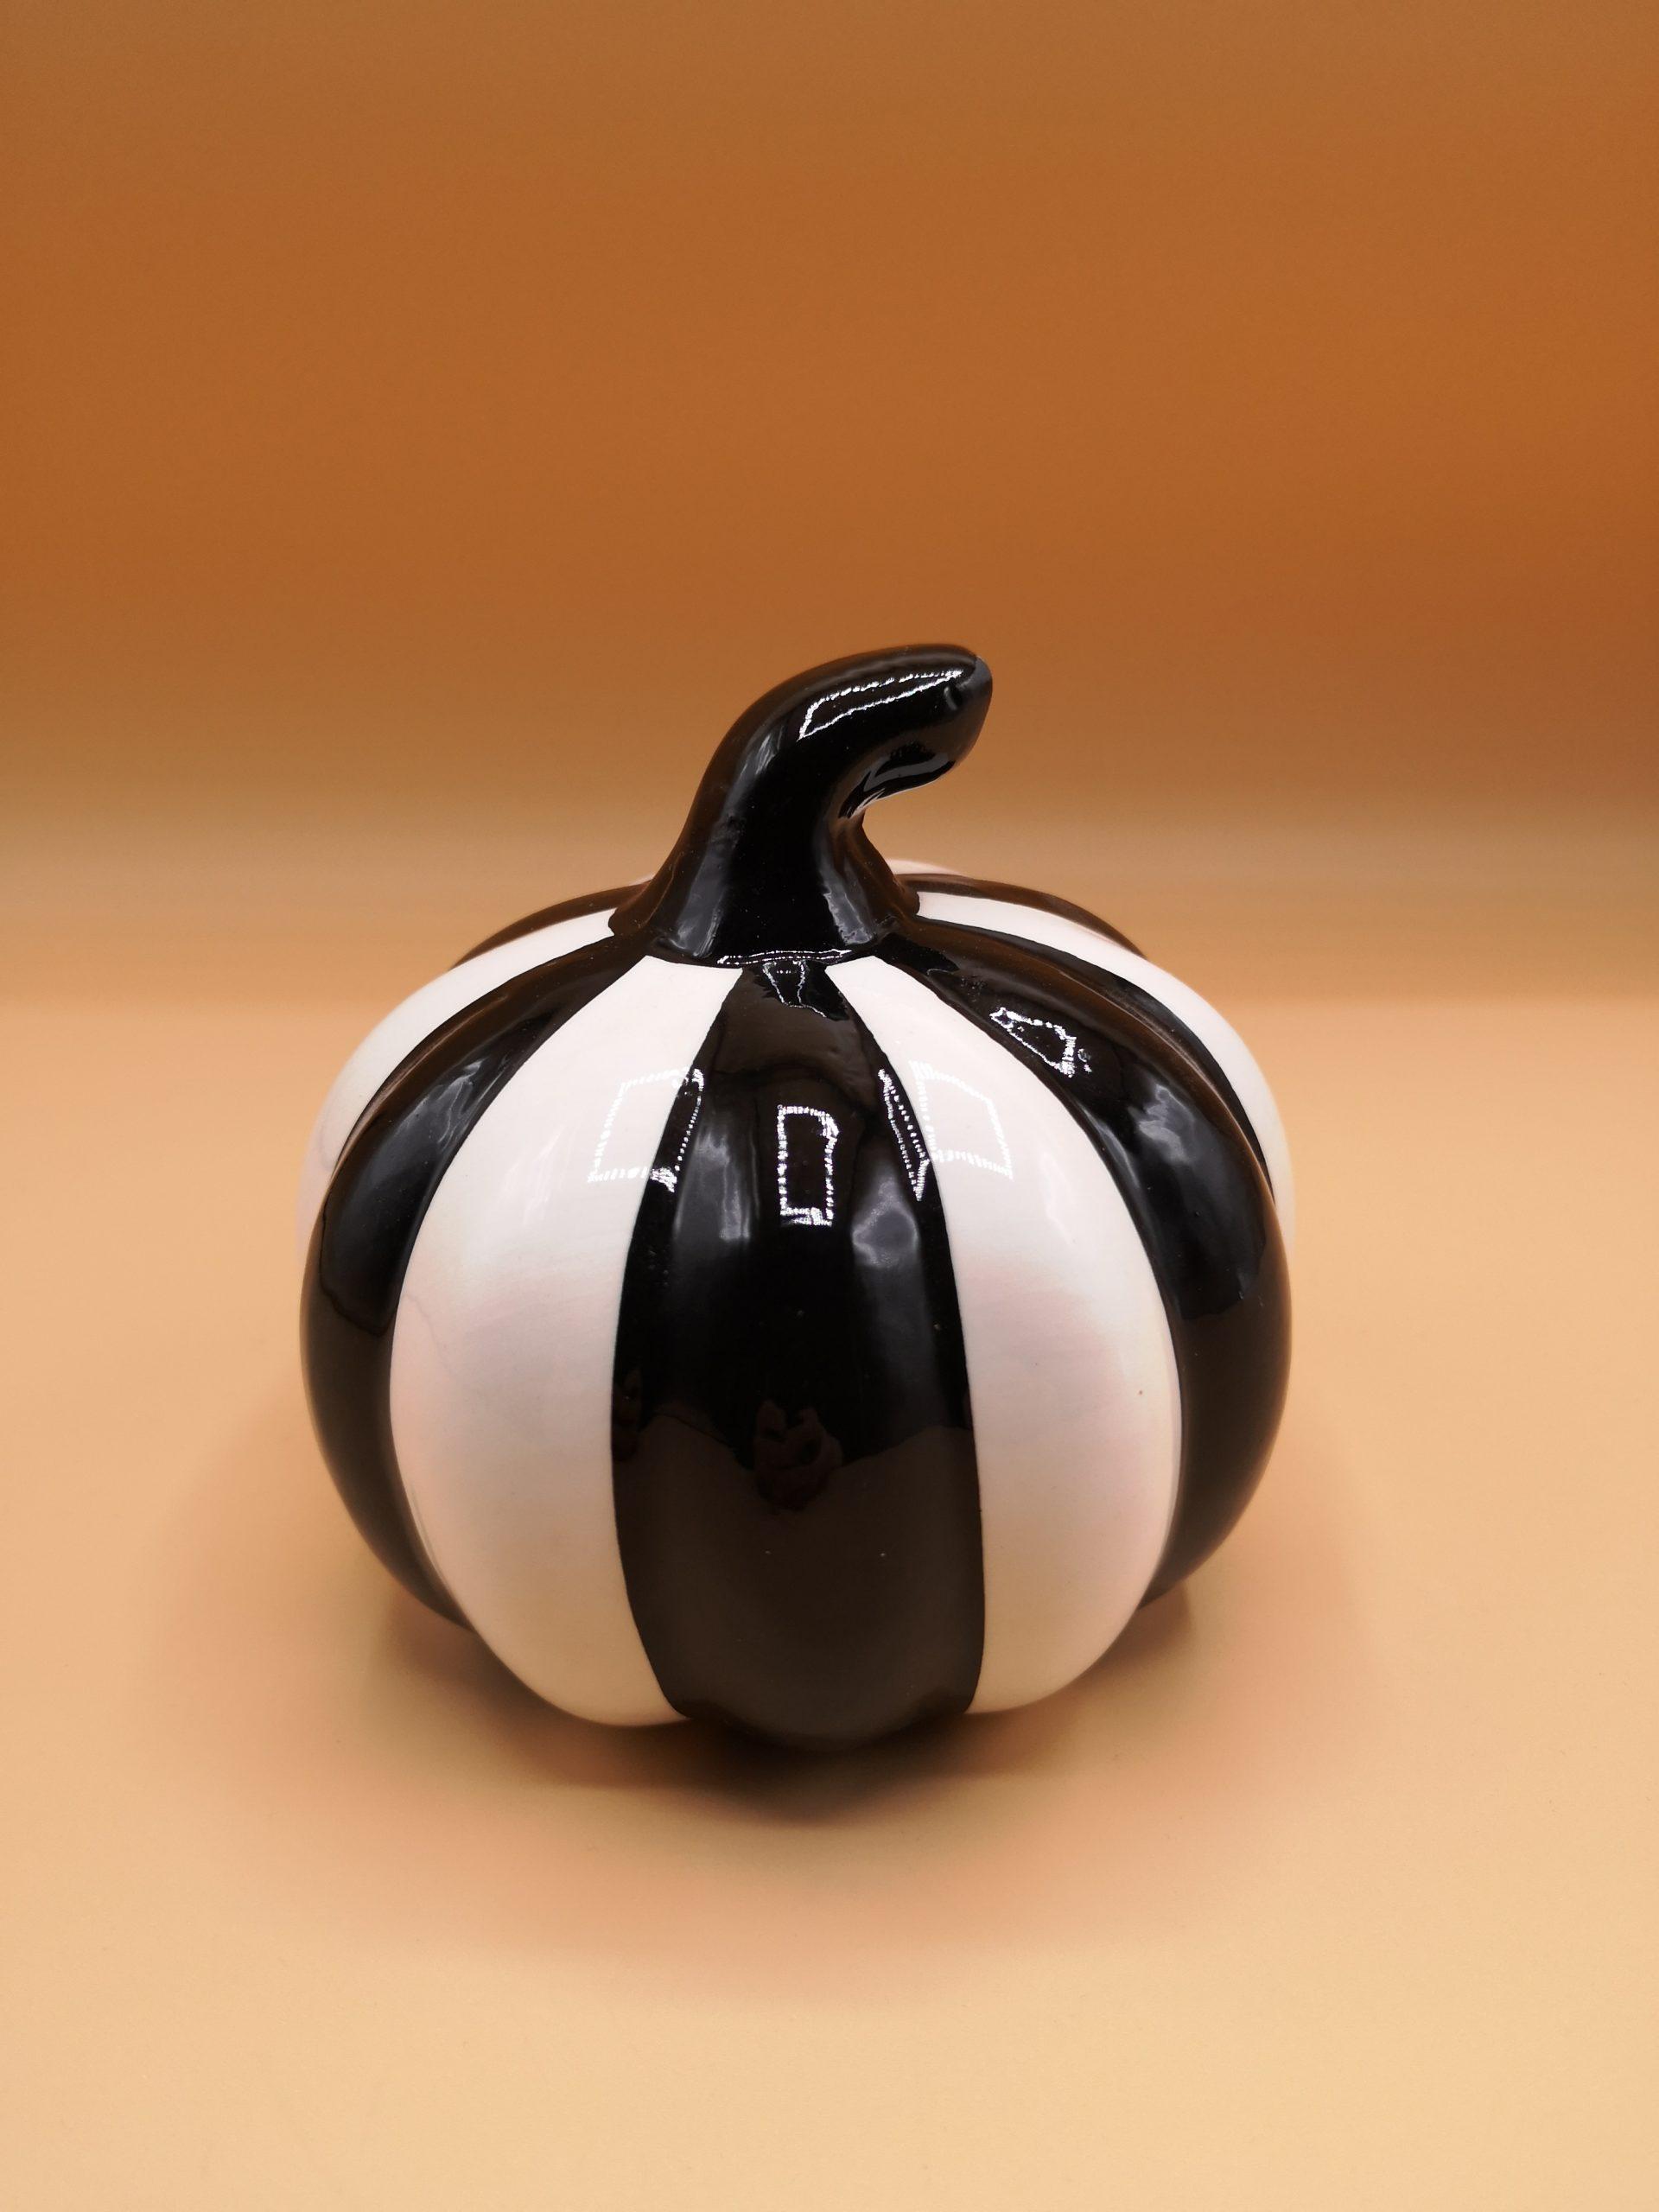 Pumpkin Beetlejuice style